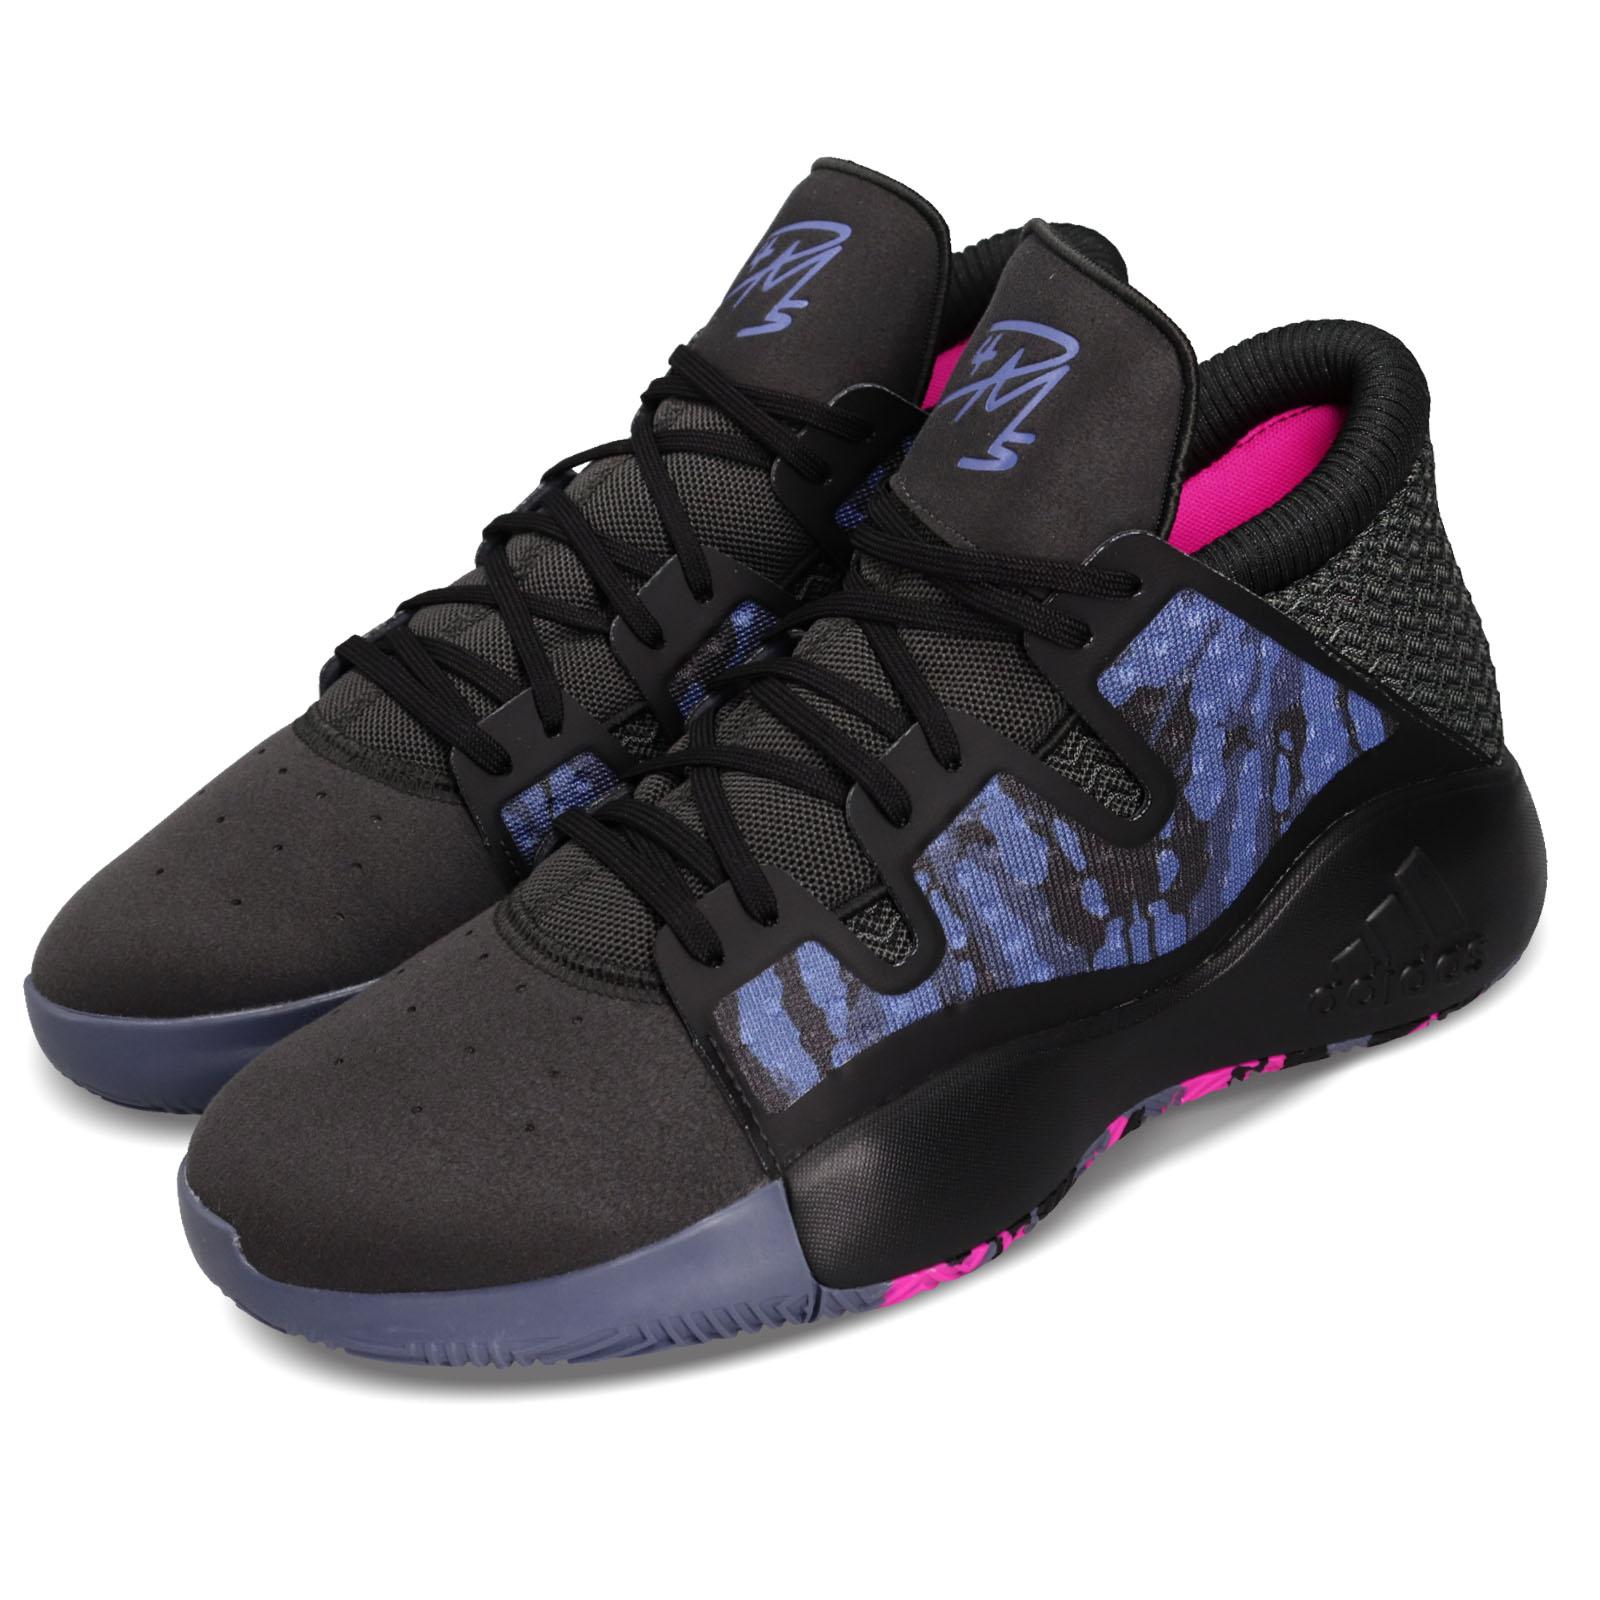 adidas 籃球鞋 Pro Vision Select 男鞋 EE6868